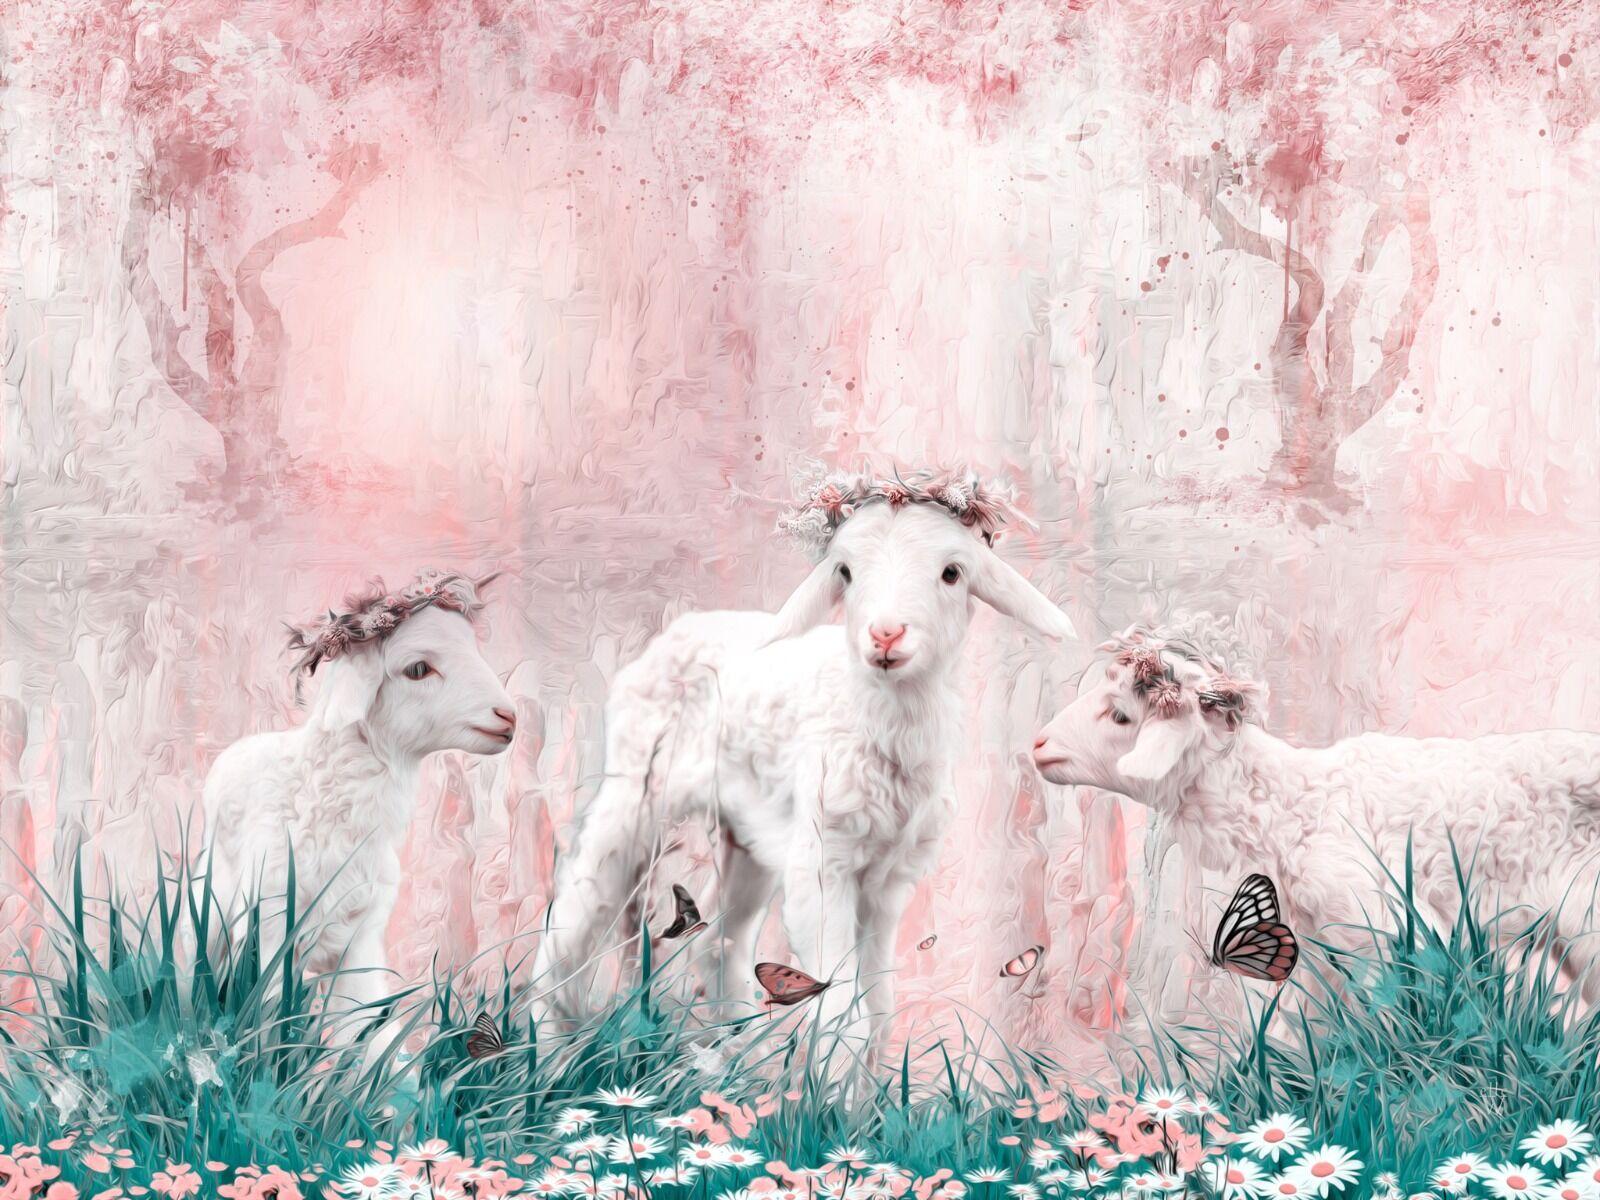 Spring lambs - Mixed Art Effect